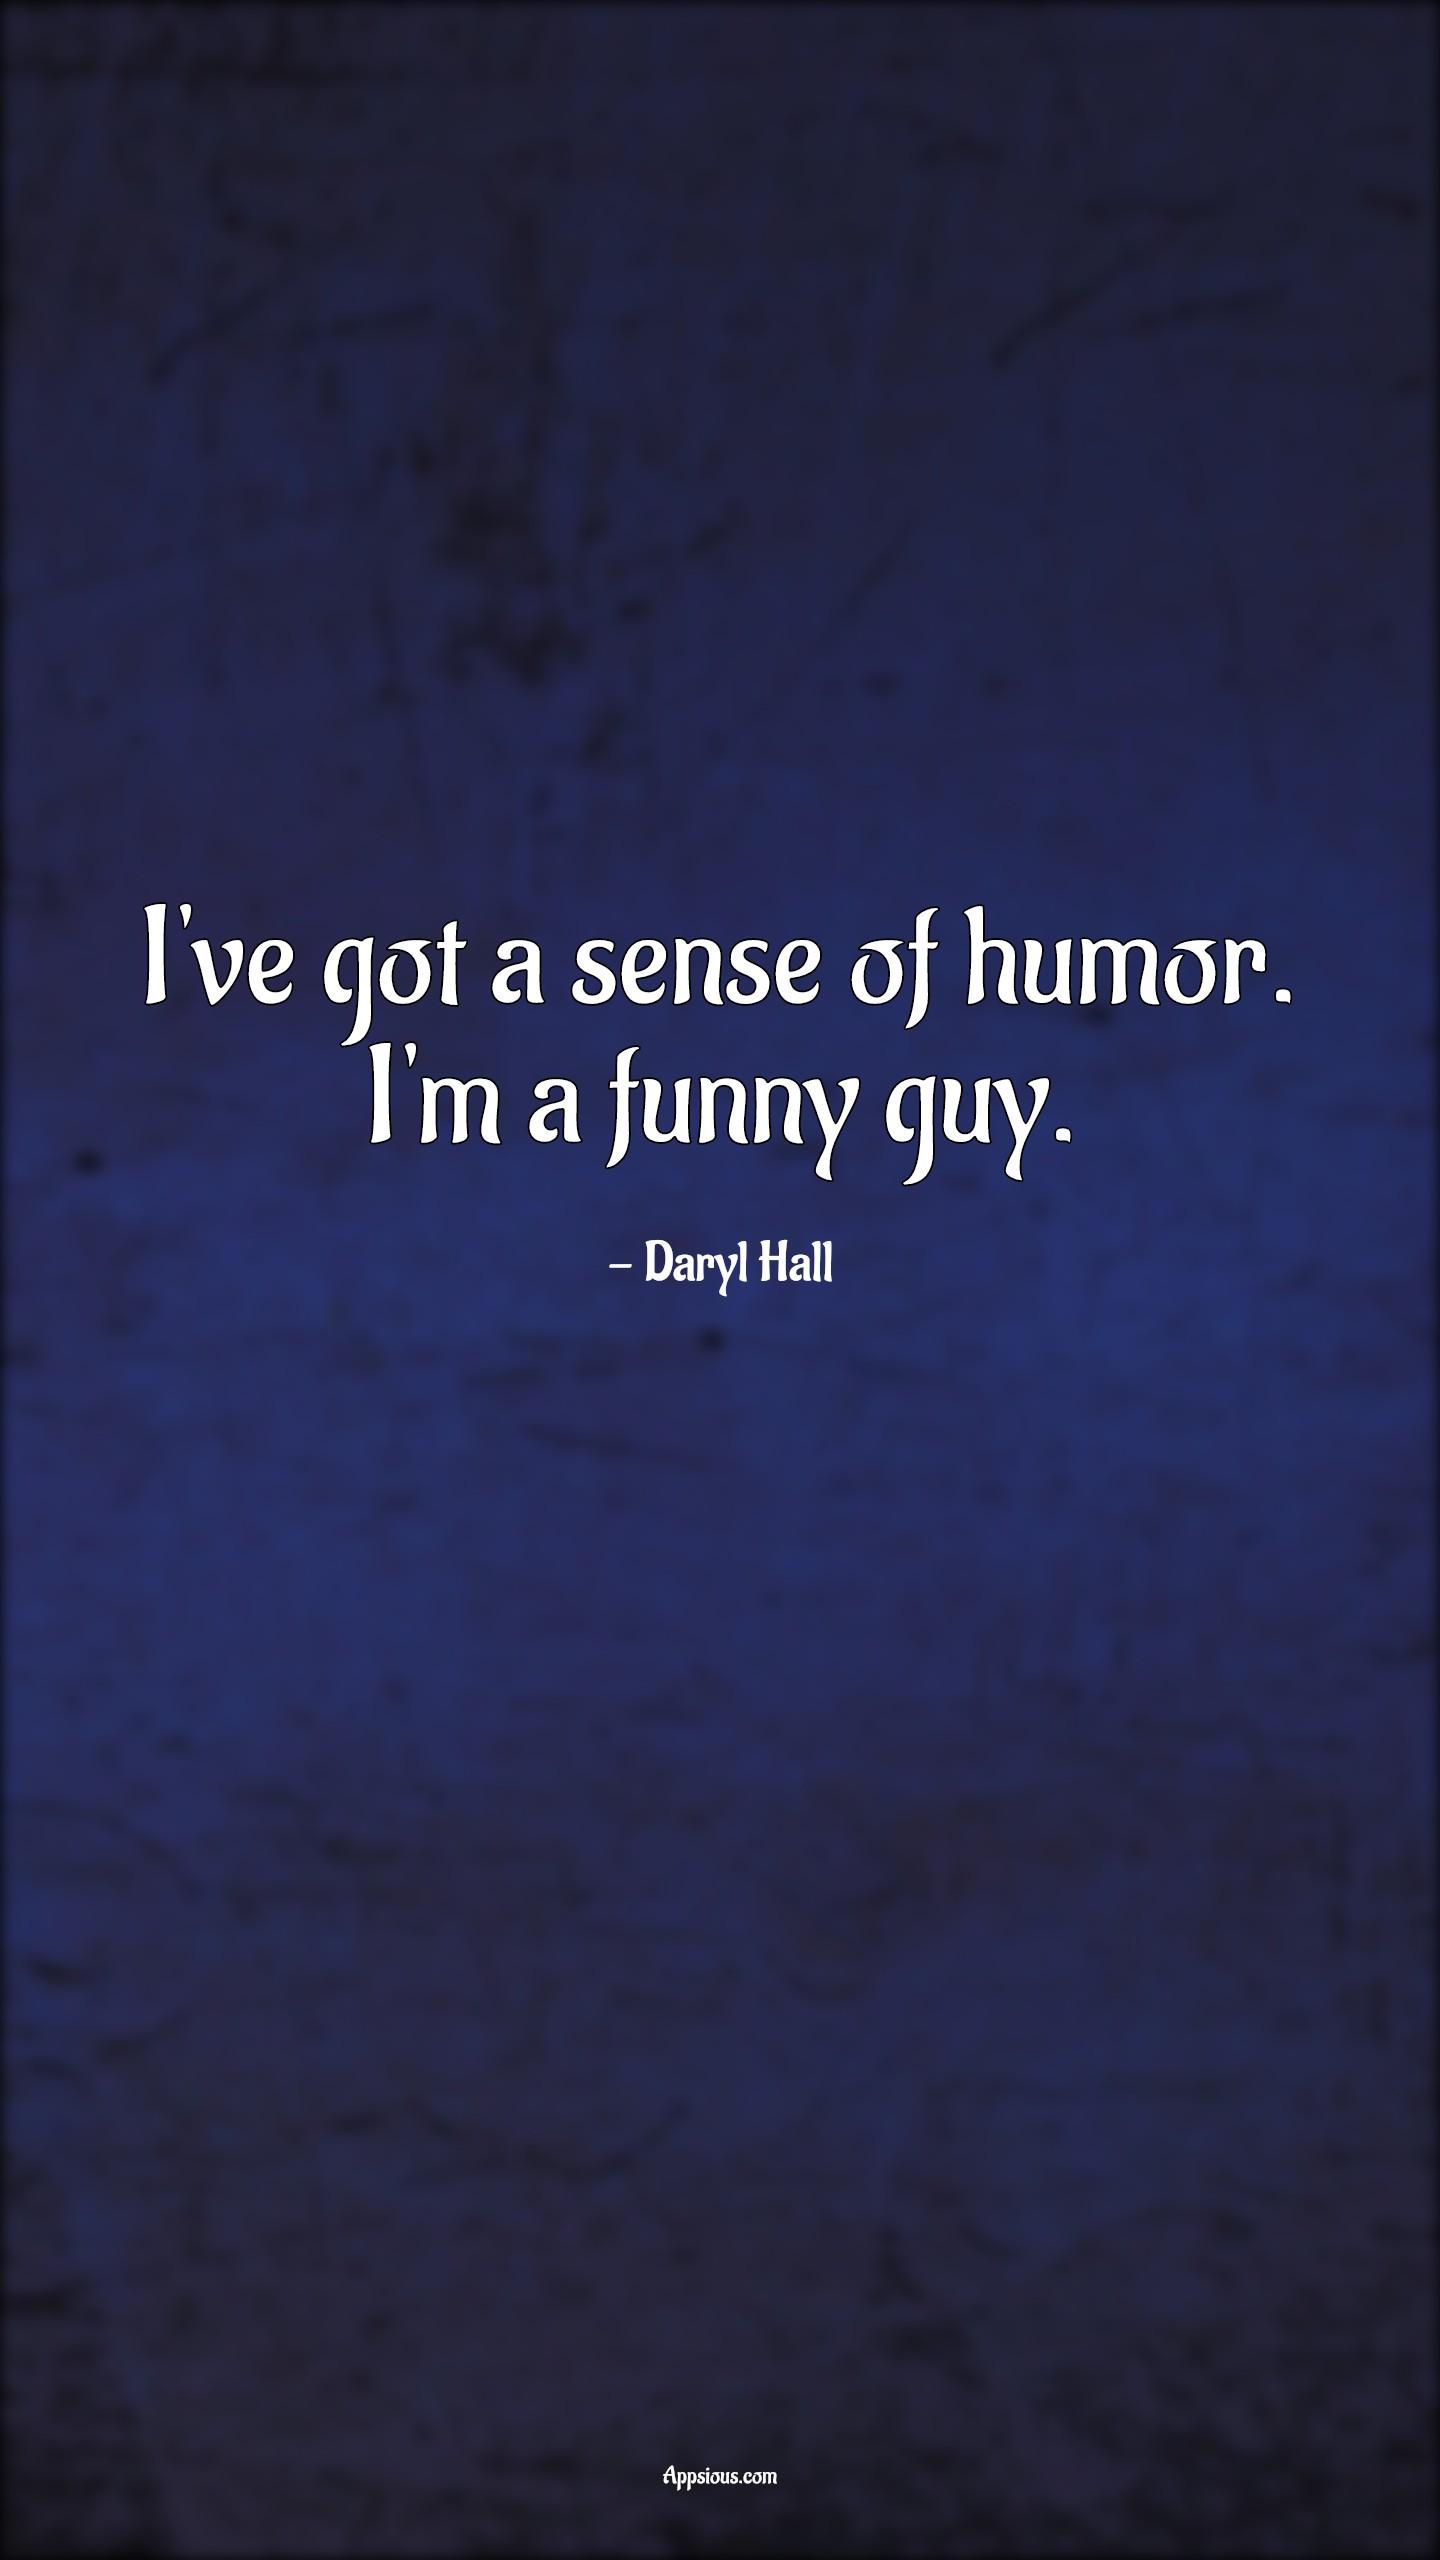 I've got a sense of humor. I'm a funny guy.